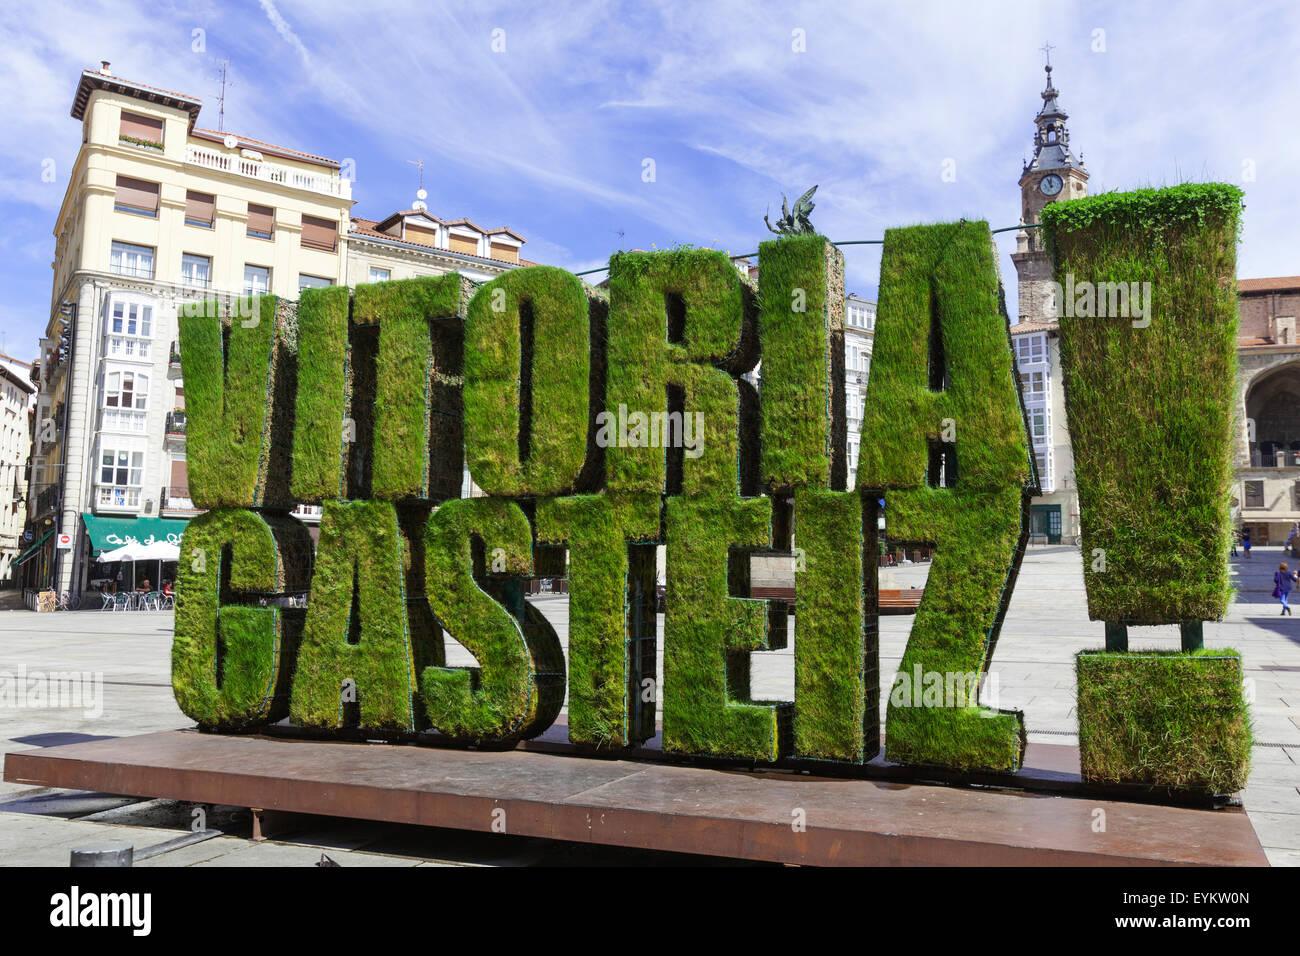 vegetable-sculpture-in-grass-of-vitoria-